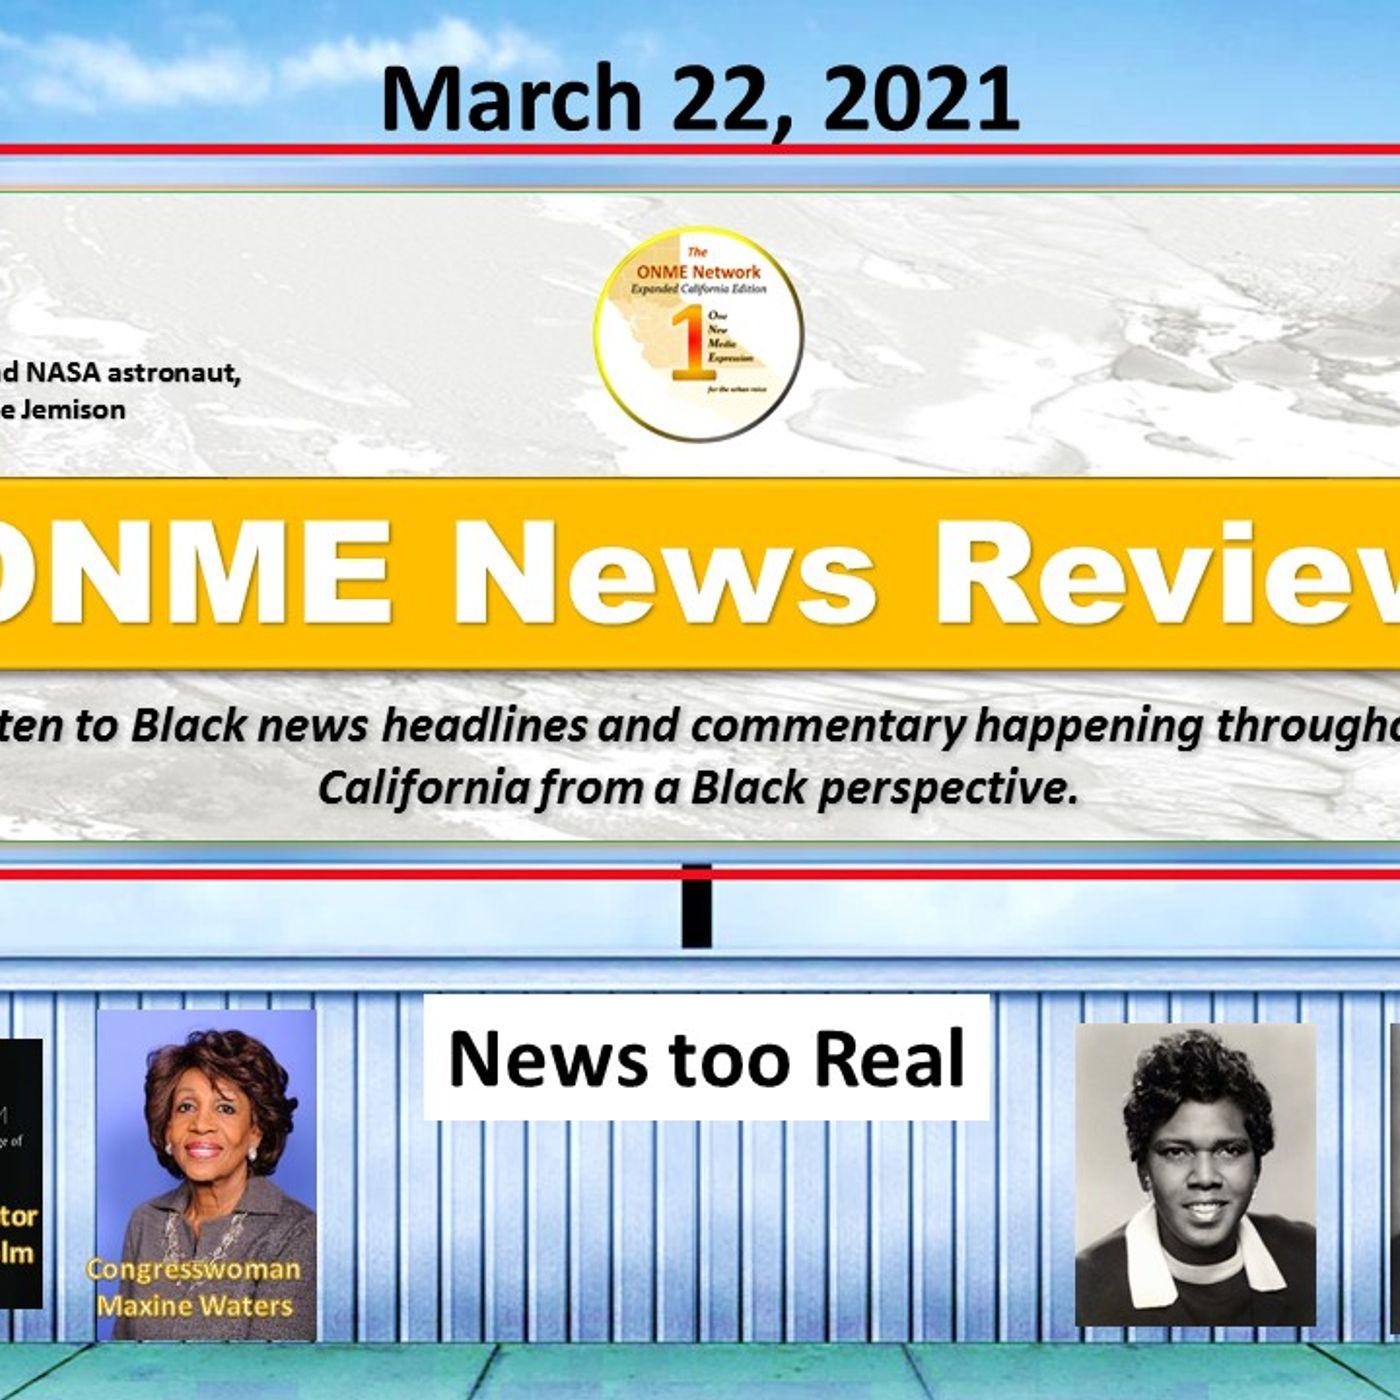 ONR-News Too Real 3-22-21:  Mutant Variants vs Vaccines Part 2